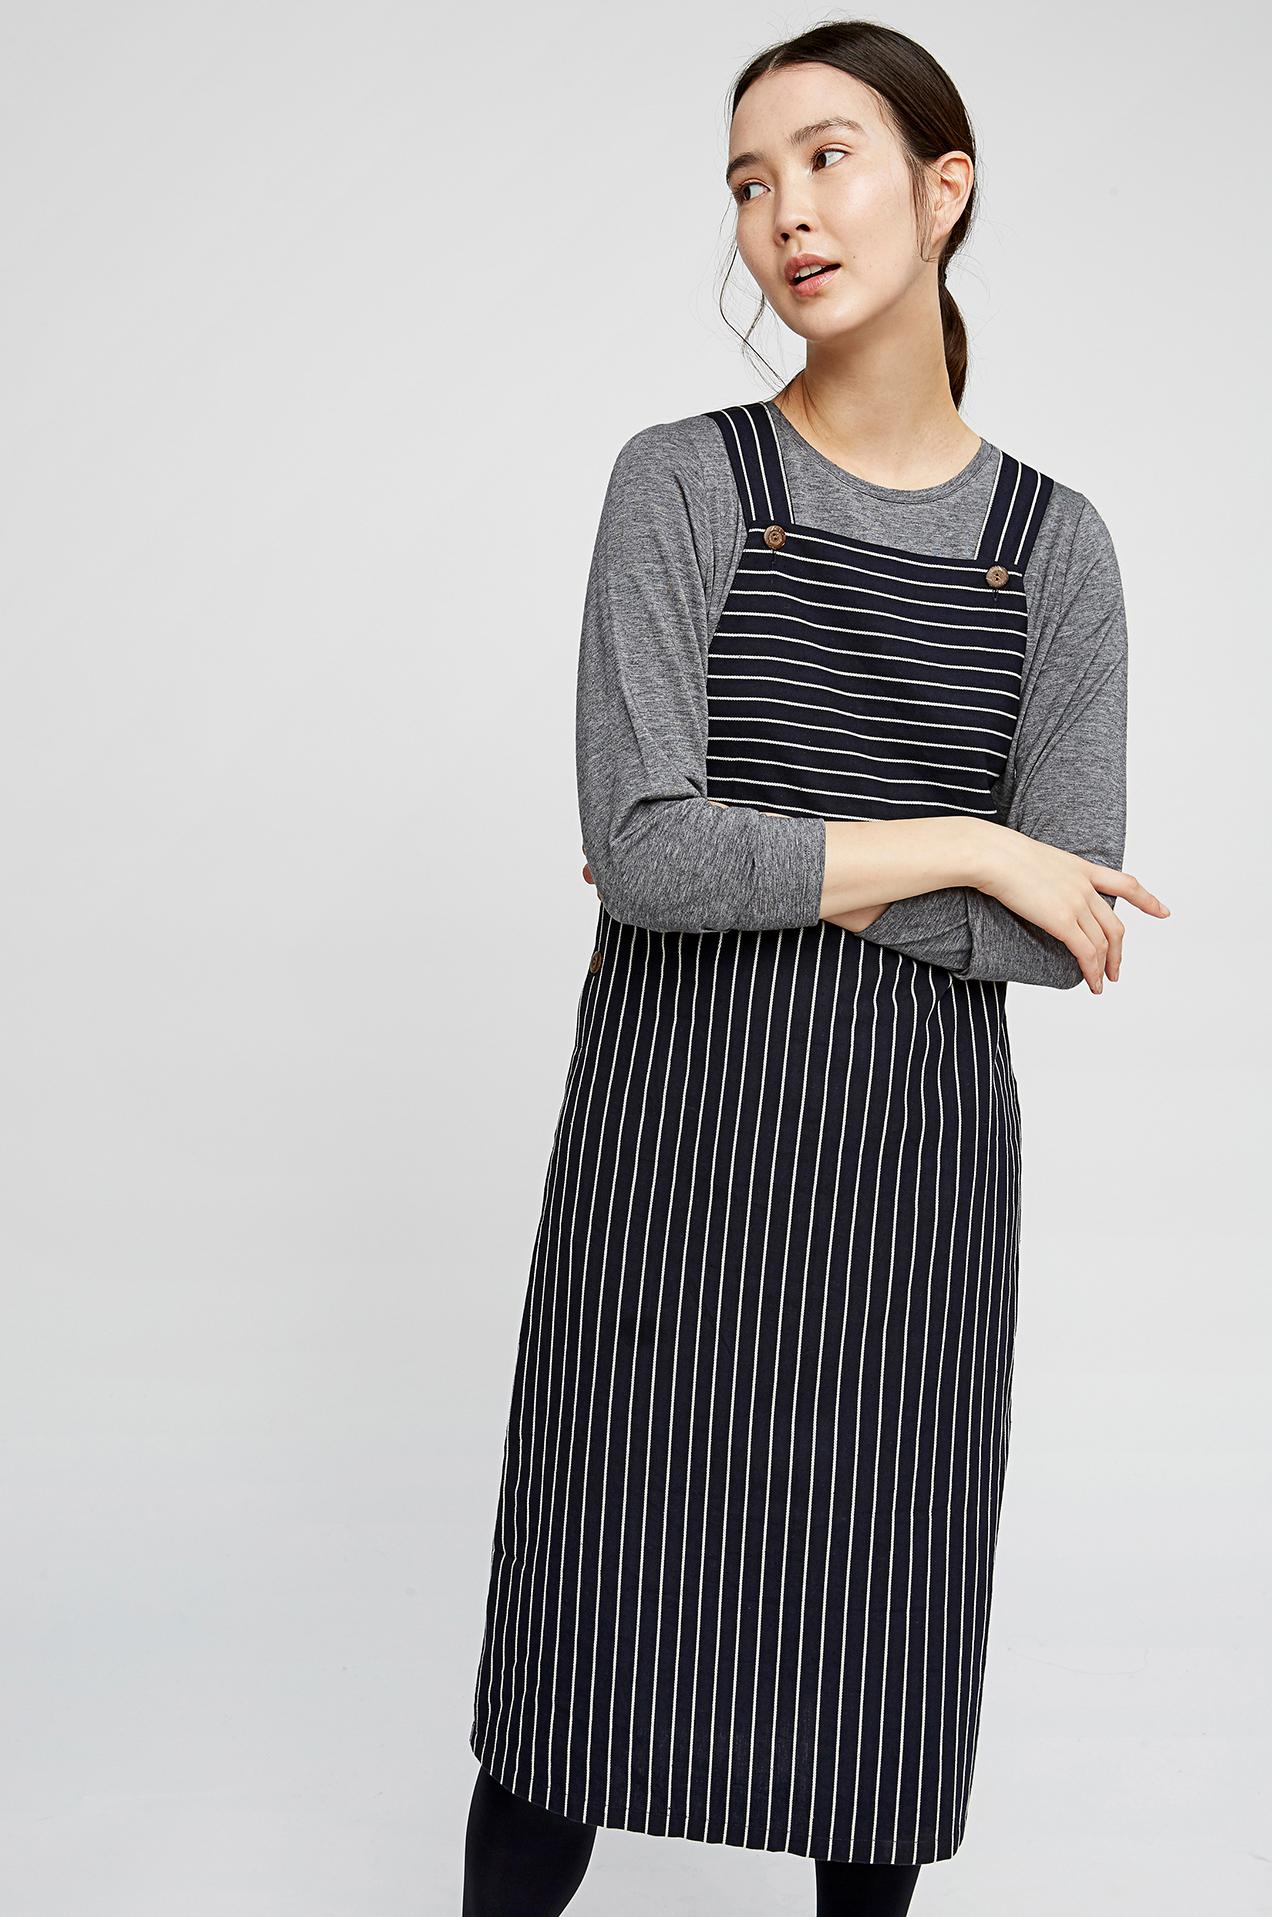 mindy-pinafore-dress-114385830a51.jpg